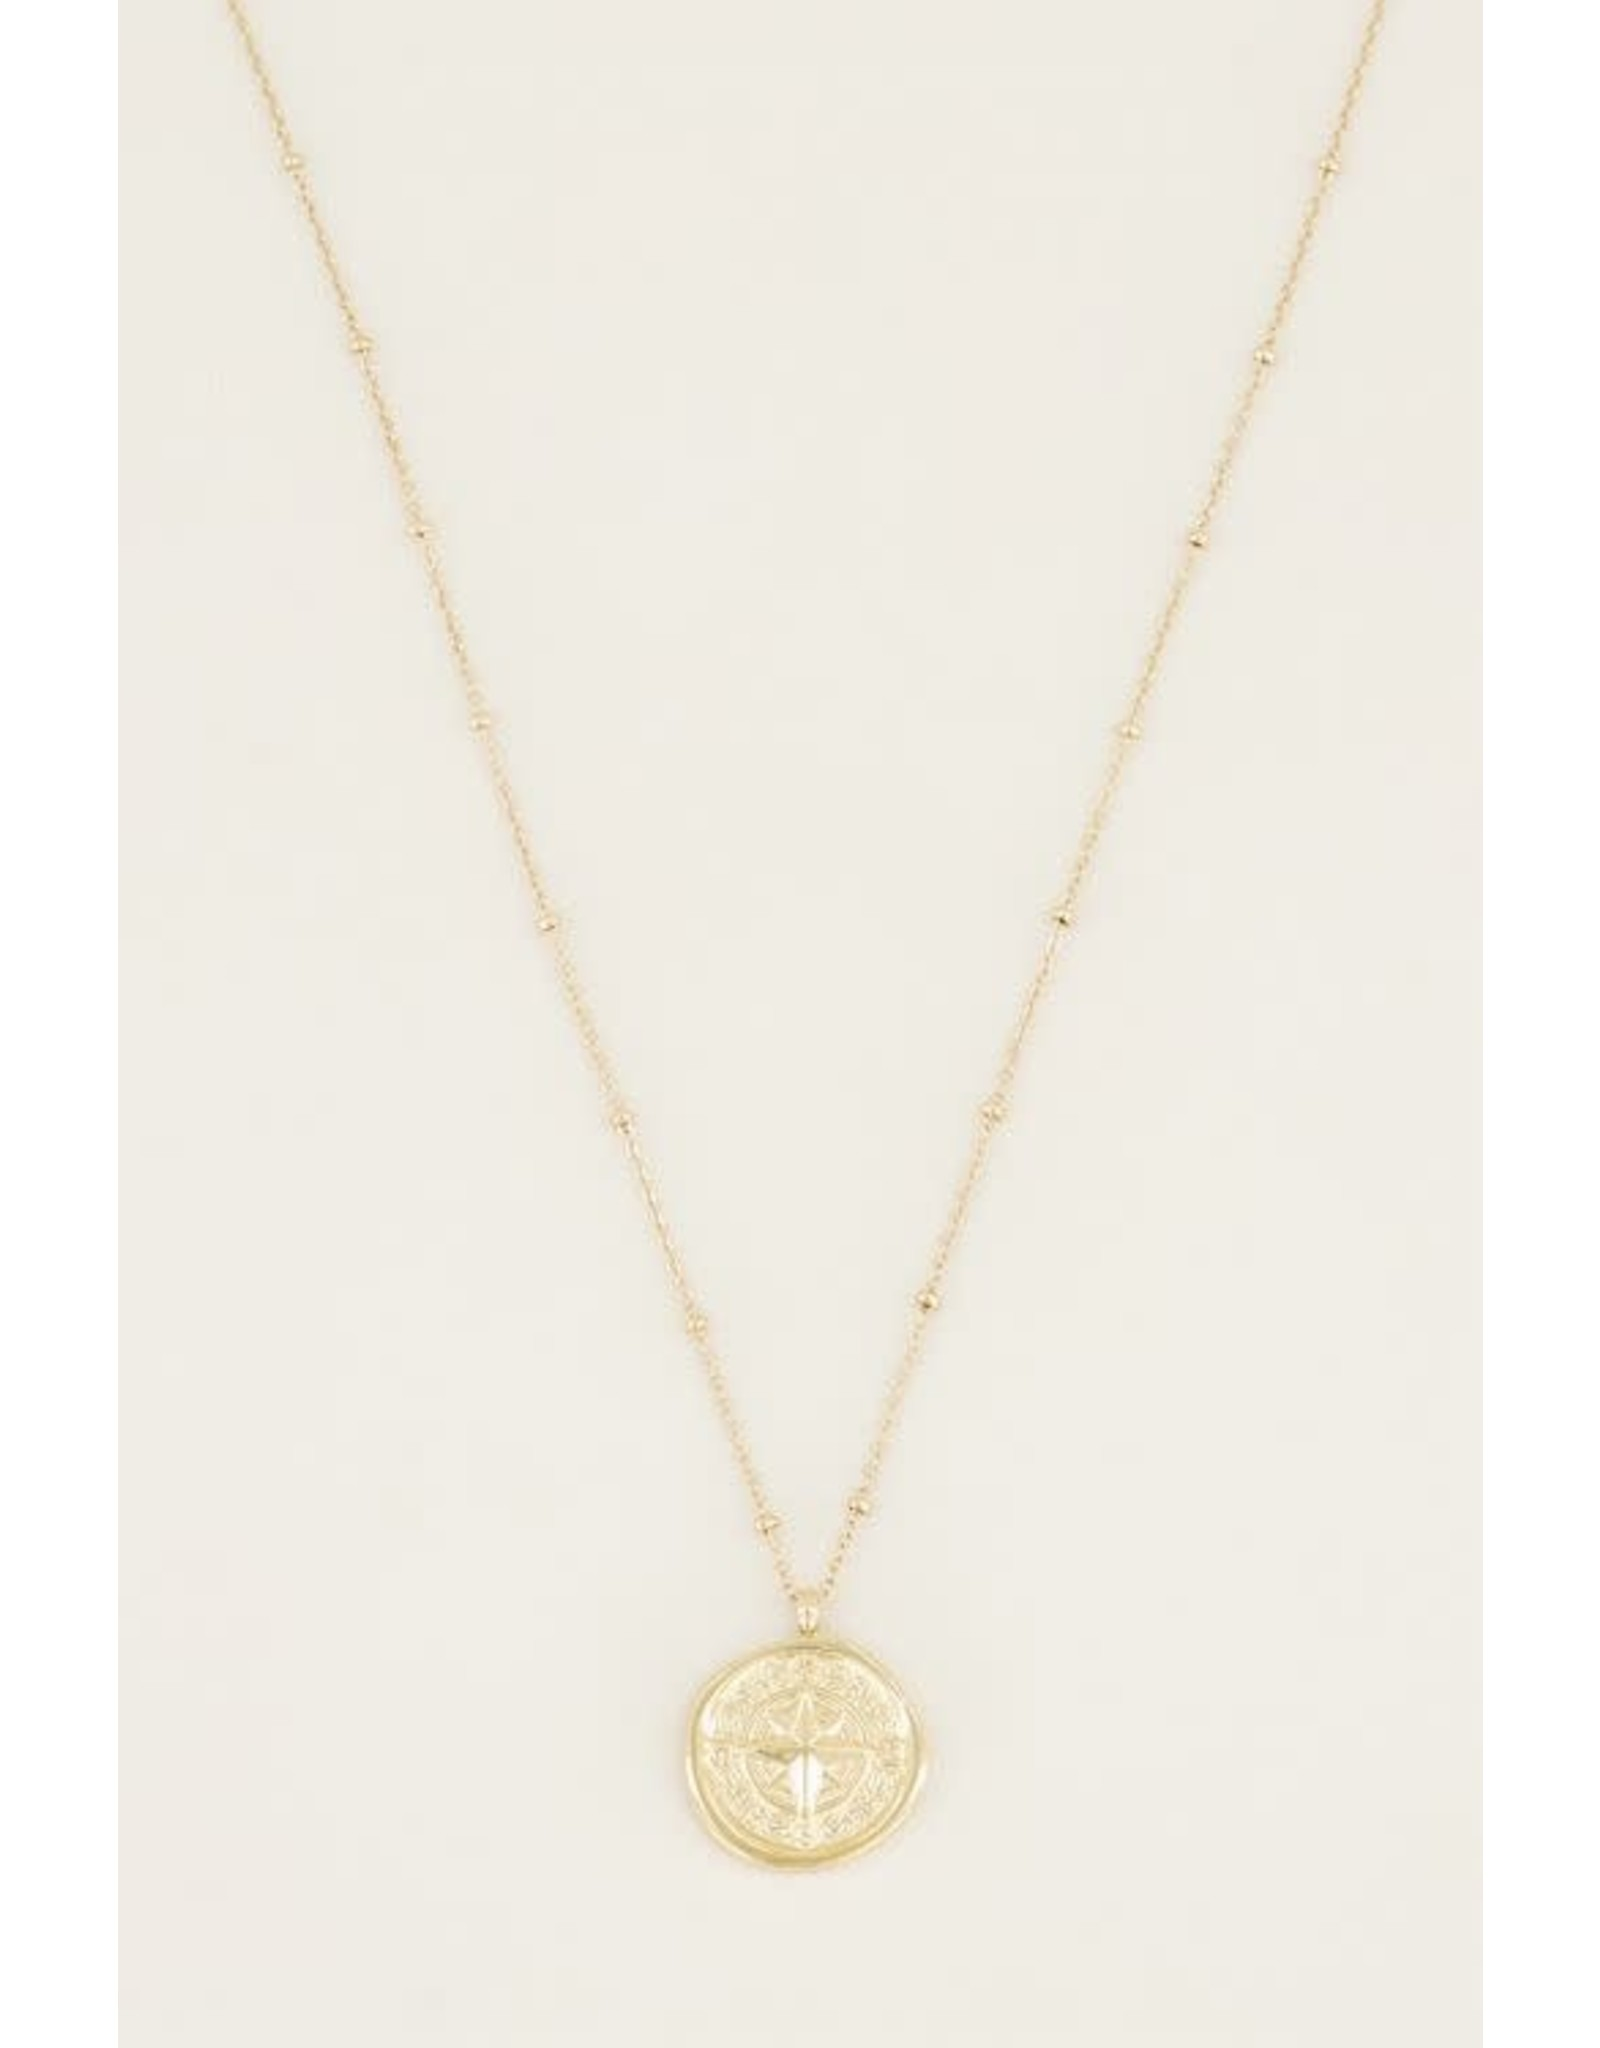 My Jewellery My Jewellery ketting kompas